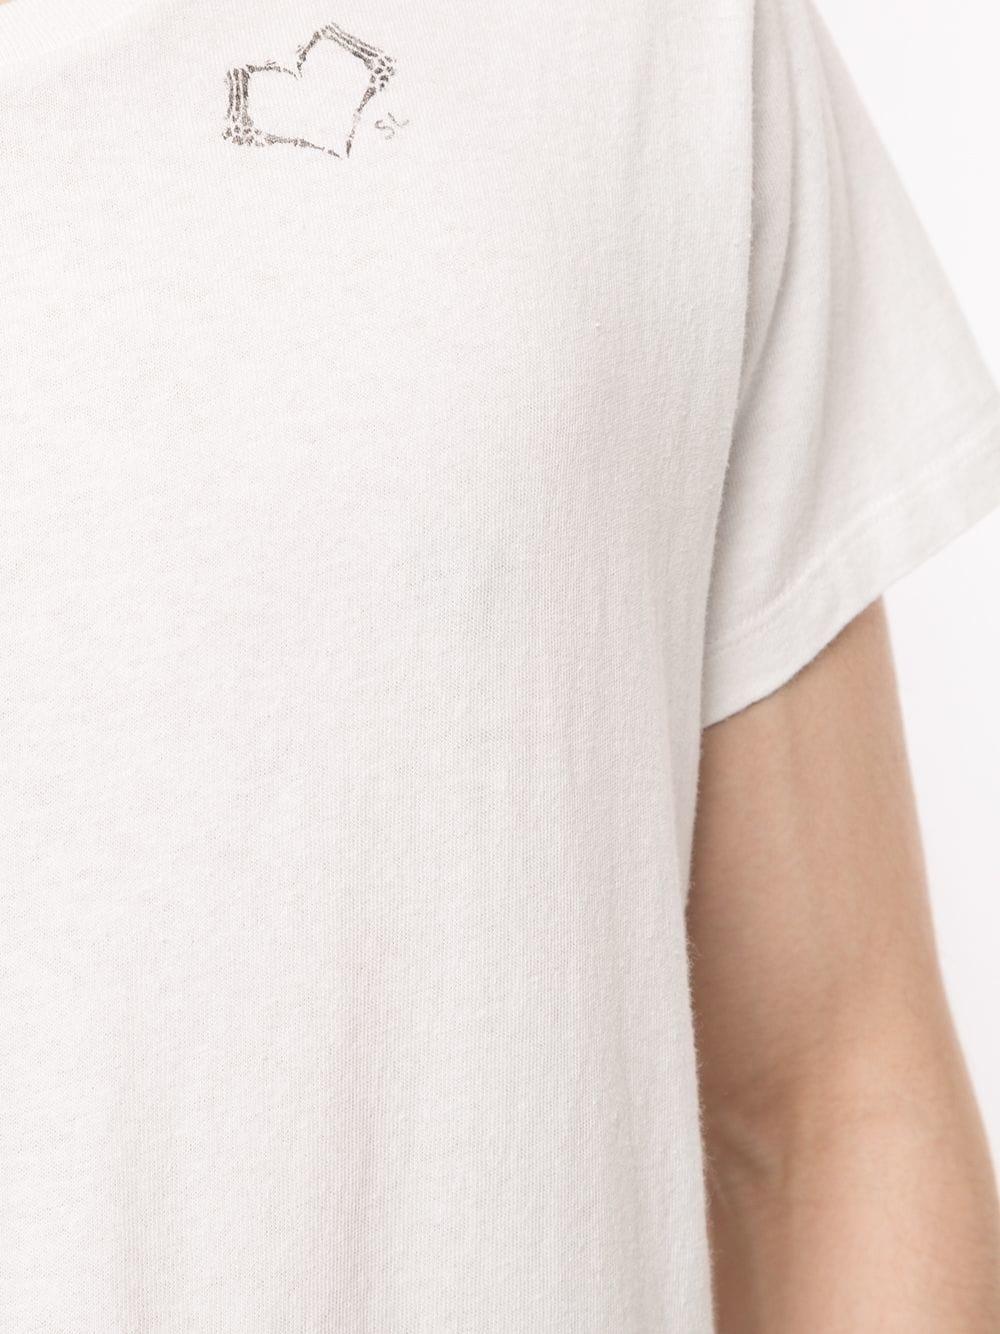 57fd8a95517 White Cotton T-Shirt with Printed Logo - SAINT LAURENT - Russocapri